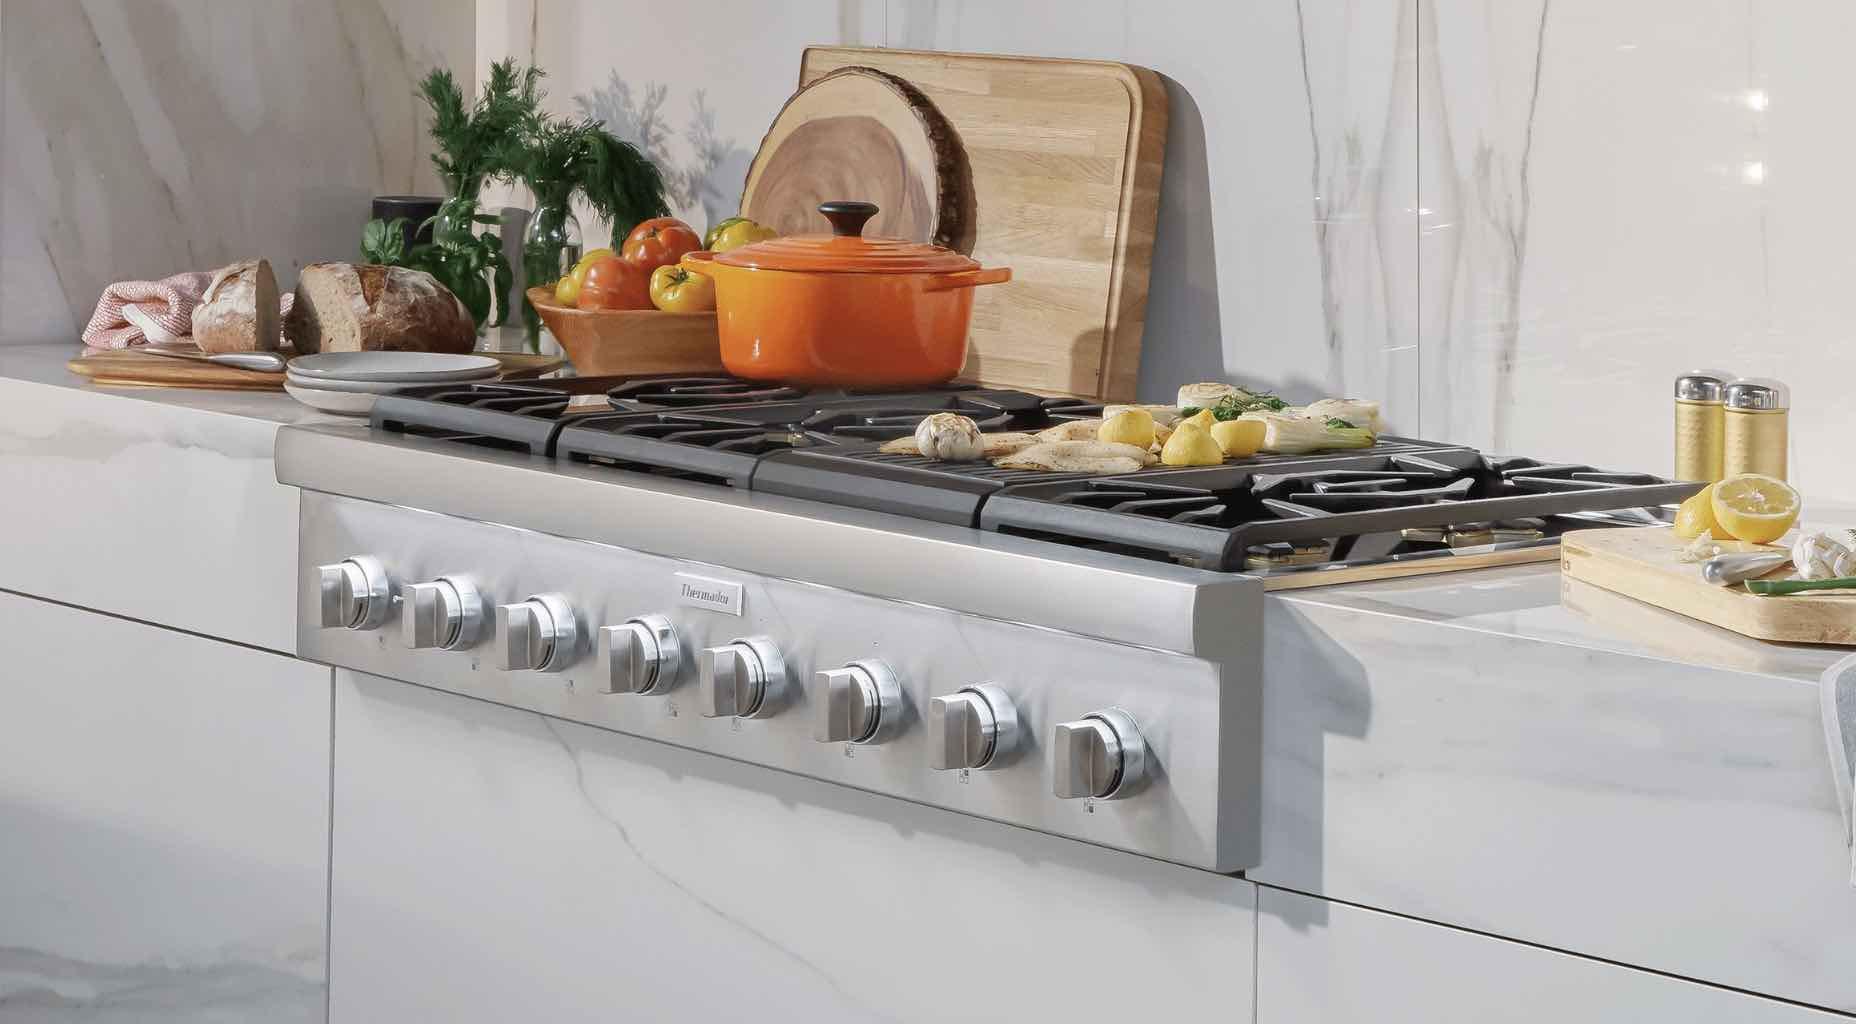 Thermador-rangetop-cooking